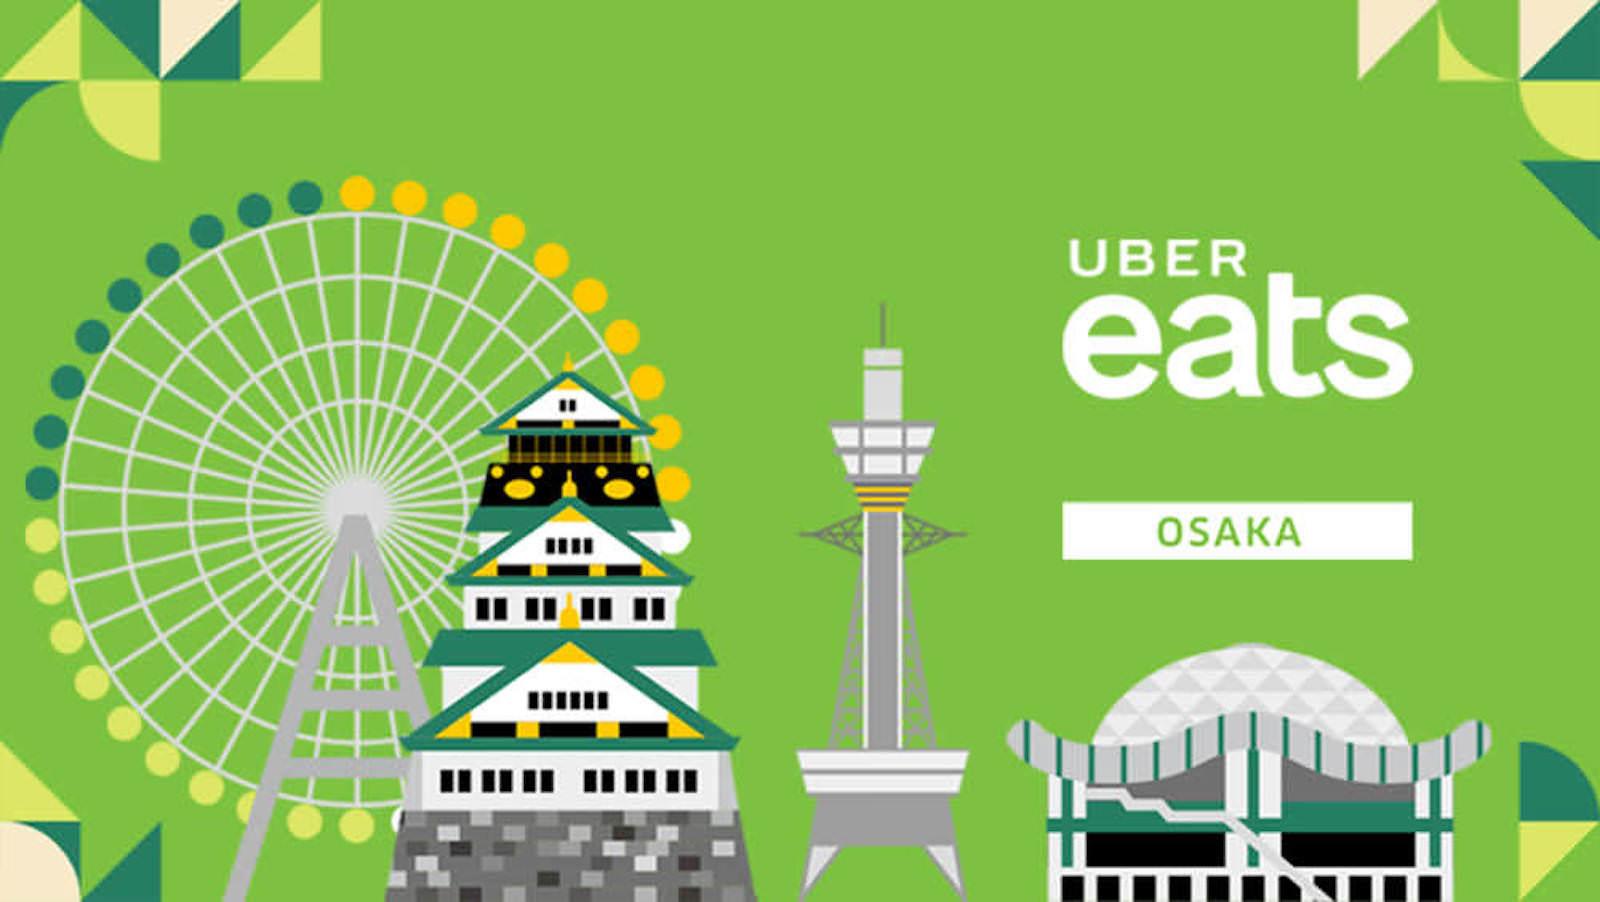 Uber Eats Osaka